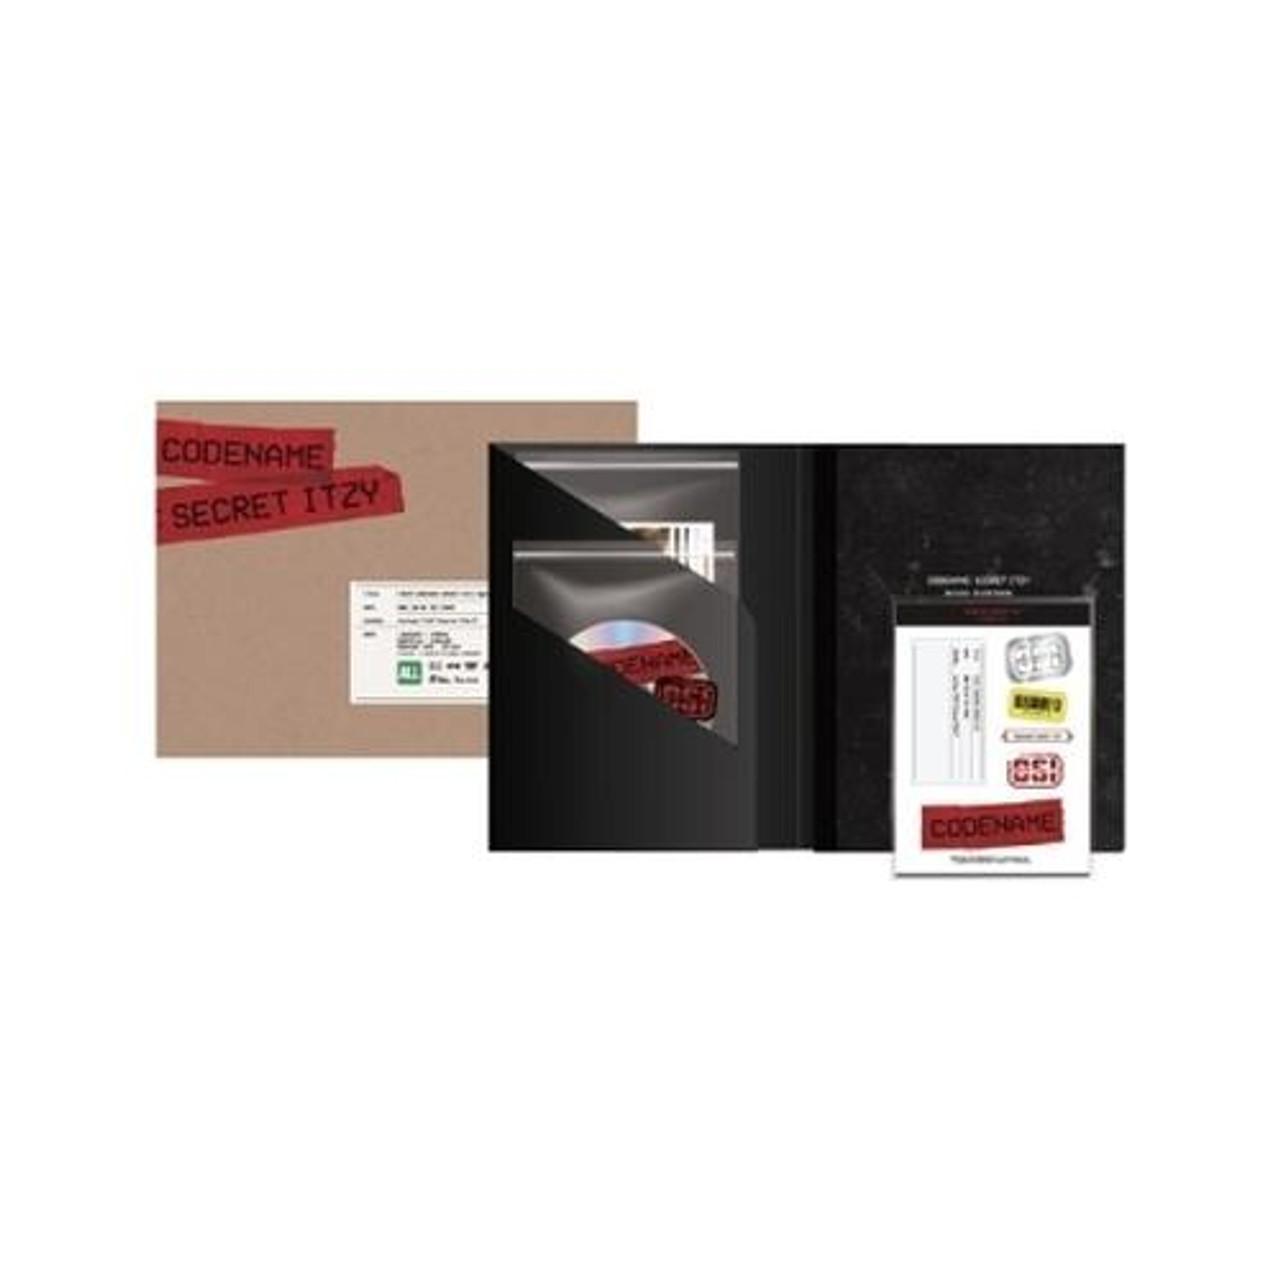 ITZY - [CODENAME : SECRET ITZY] BEHIND DVD PHOTOBOOK PACKAGE